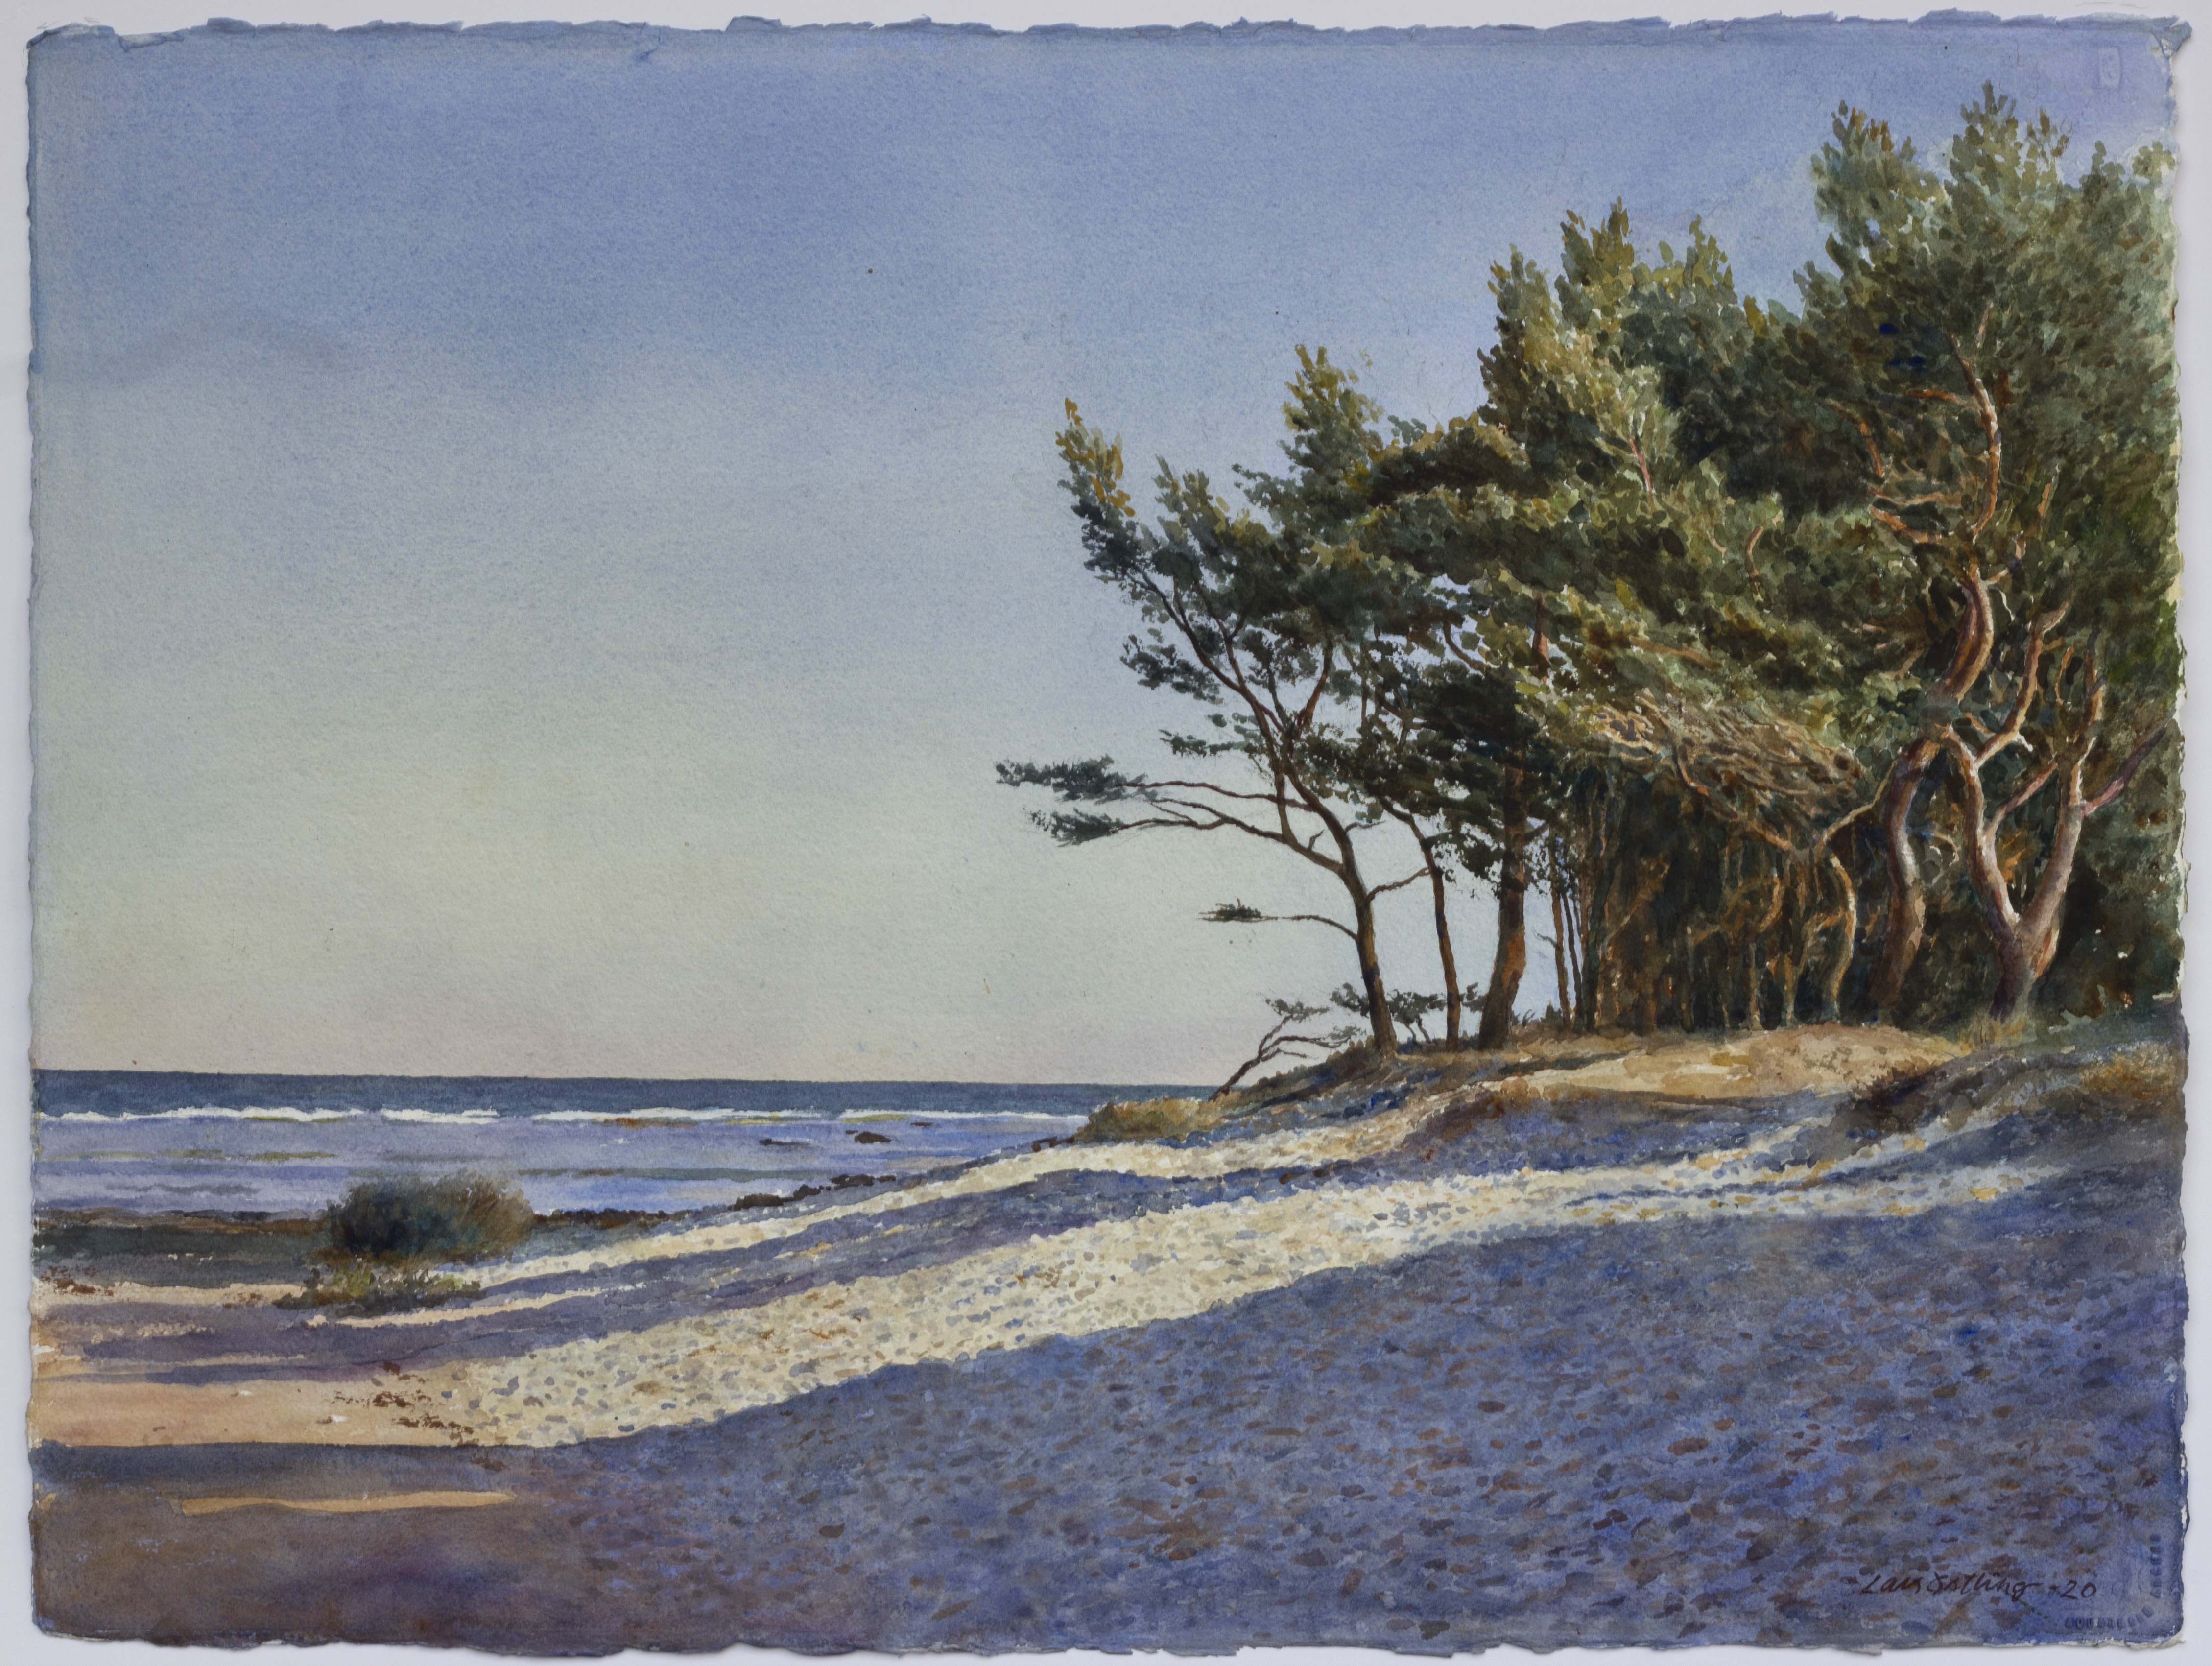 Lars Östling - Strandbild Norsta Auren, gicléetryck